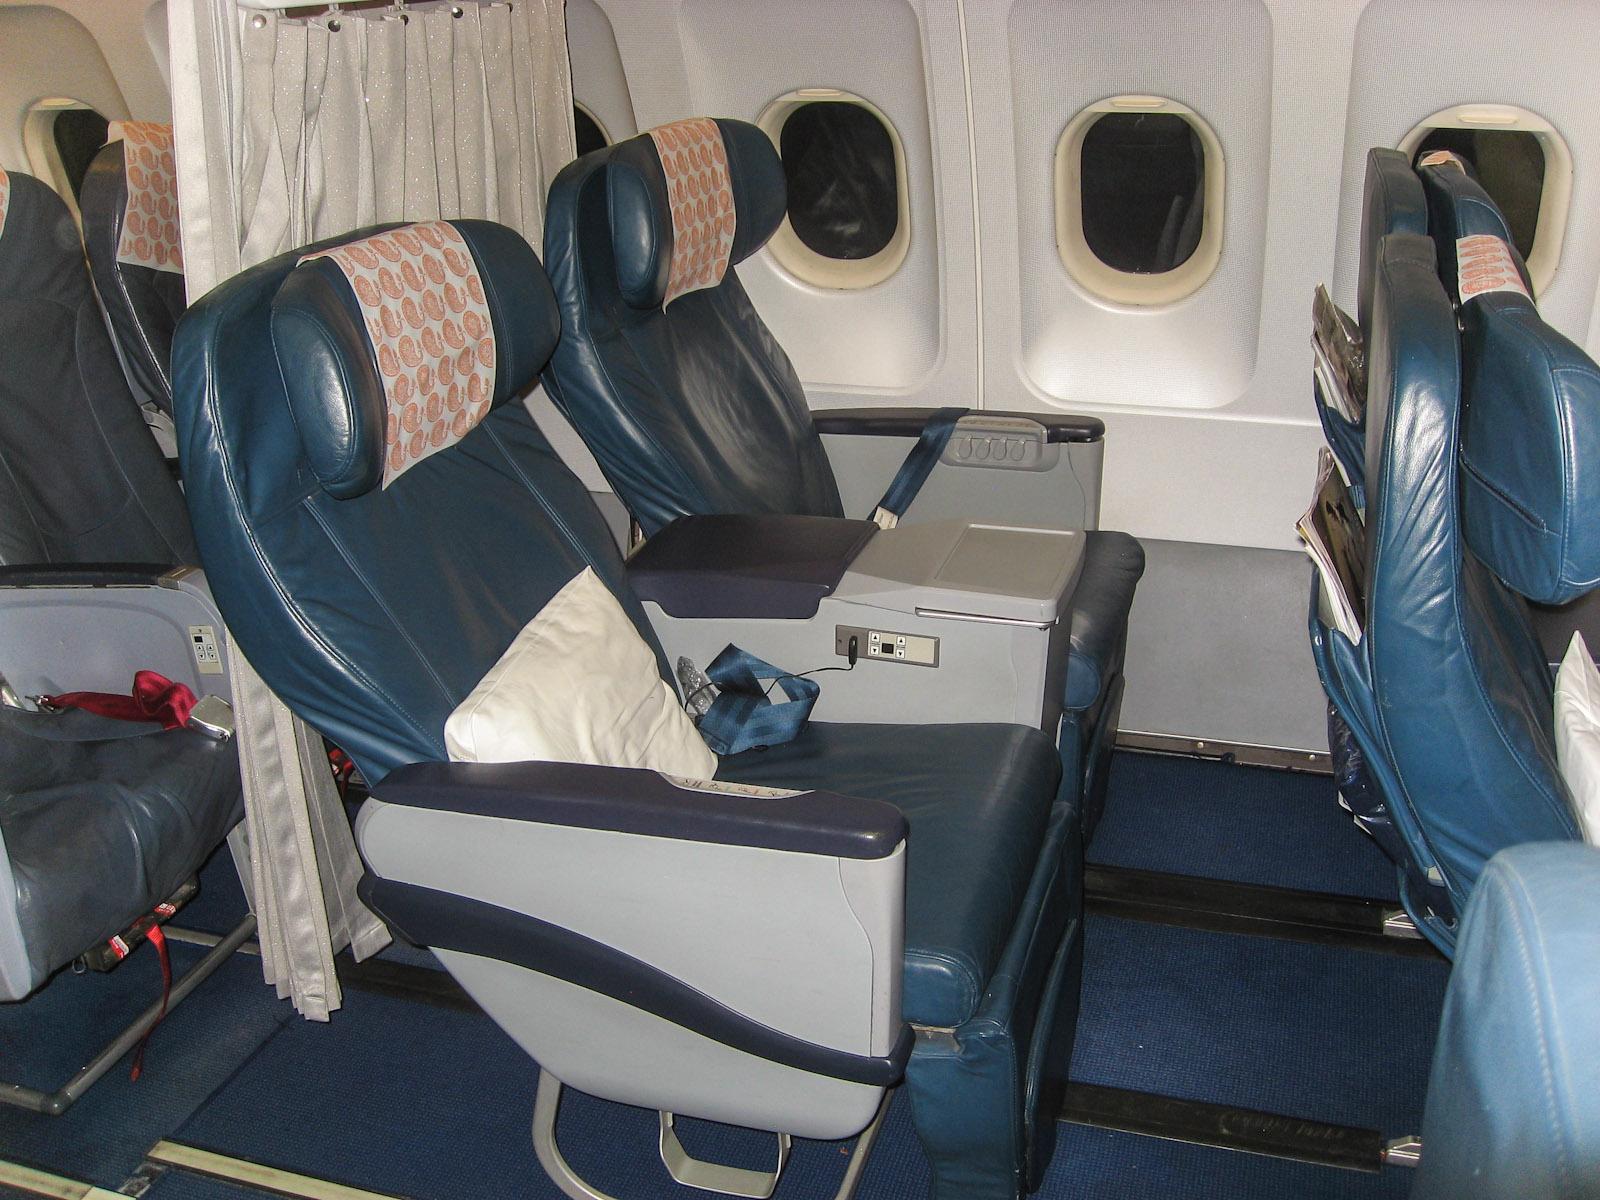 Кресла бизнес-класса в Airbus A320 Азербайджанских авиалиний